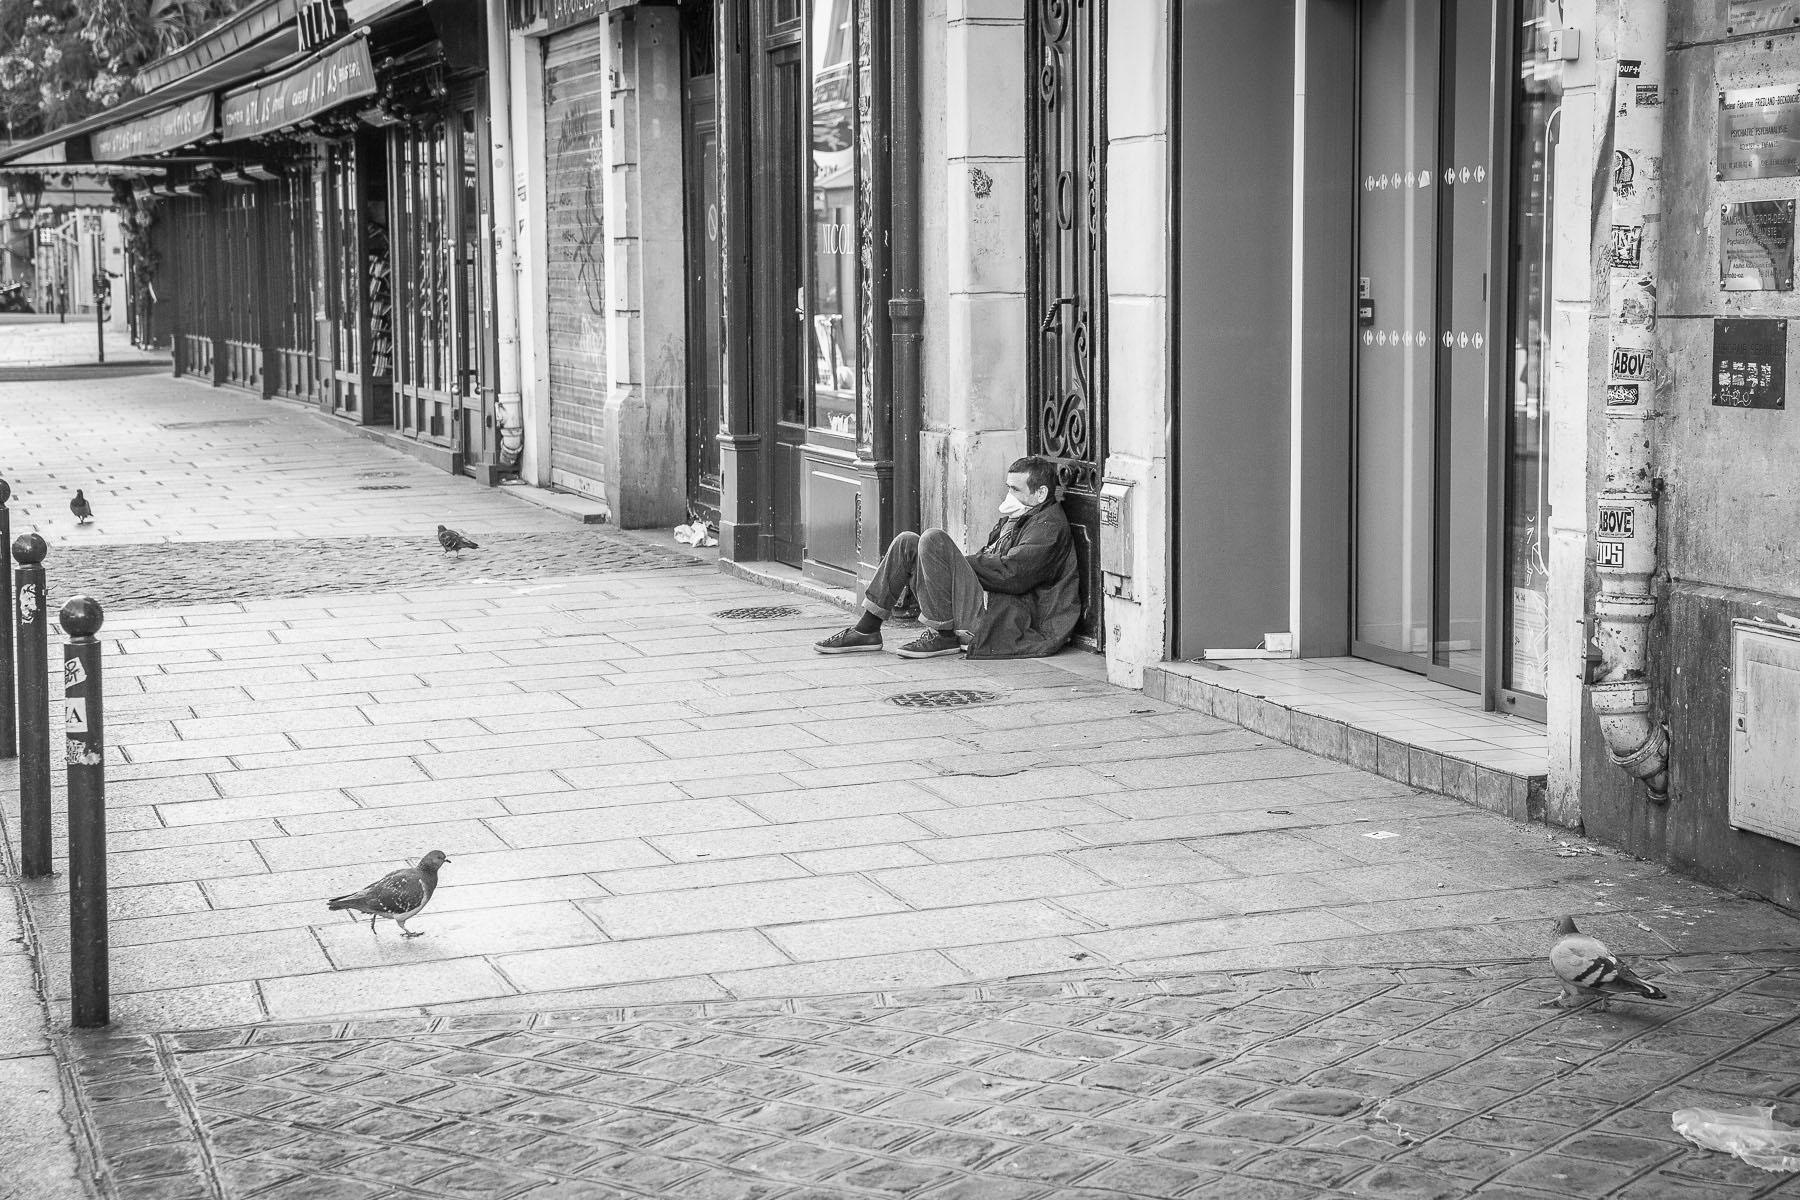 Rue de Buci. March 2020